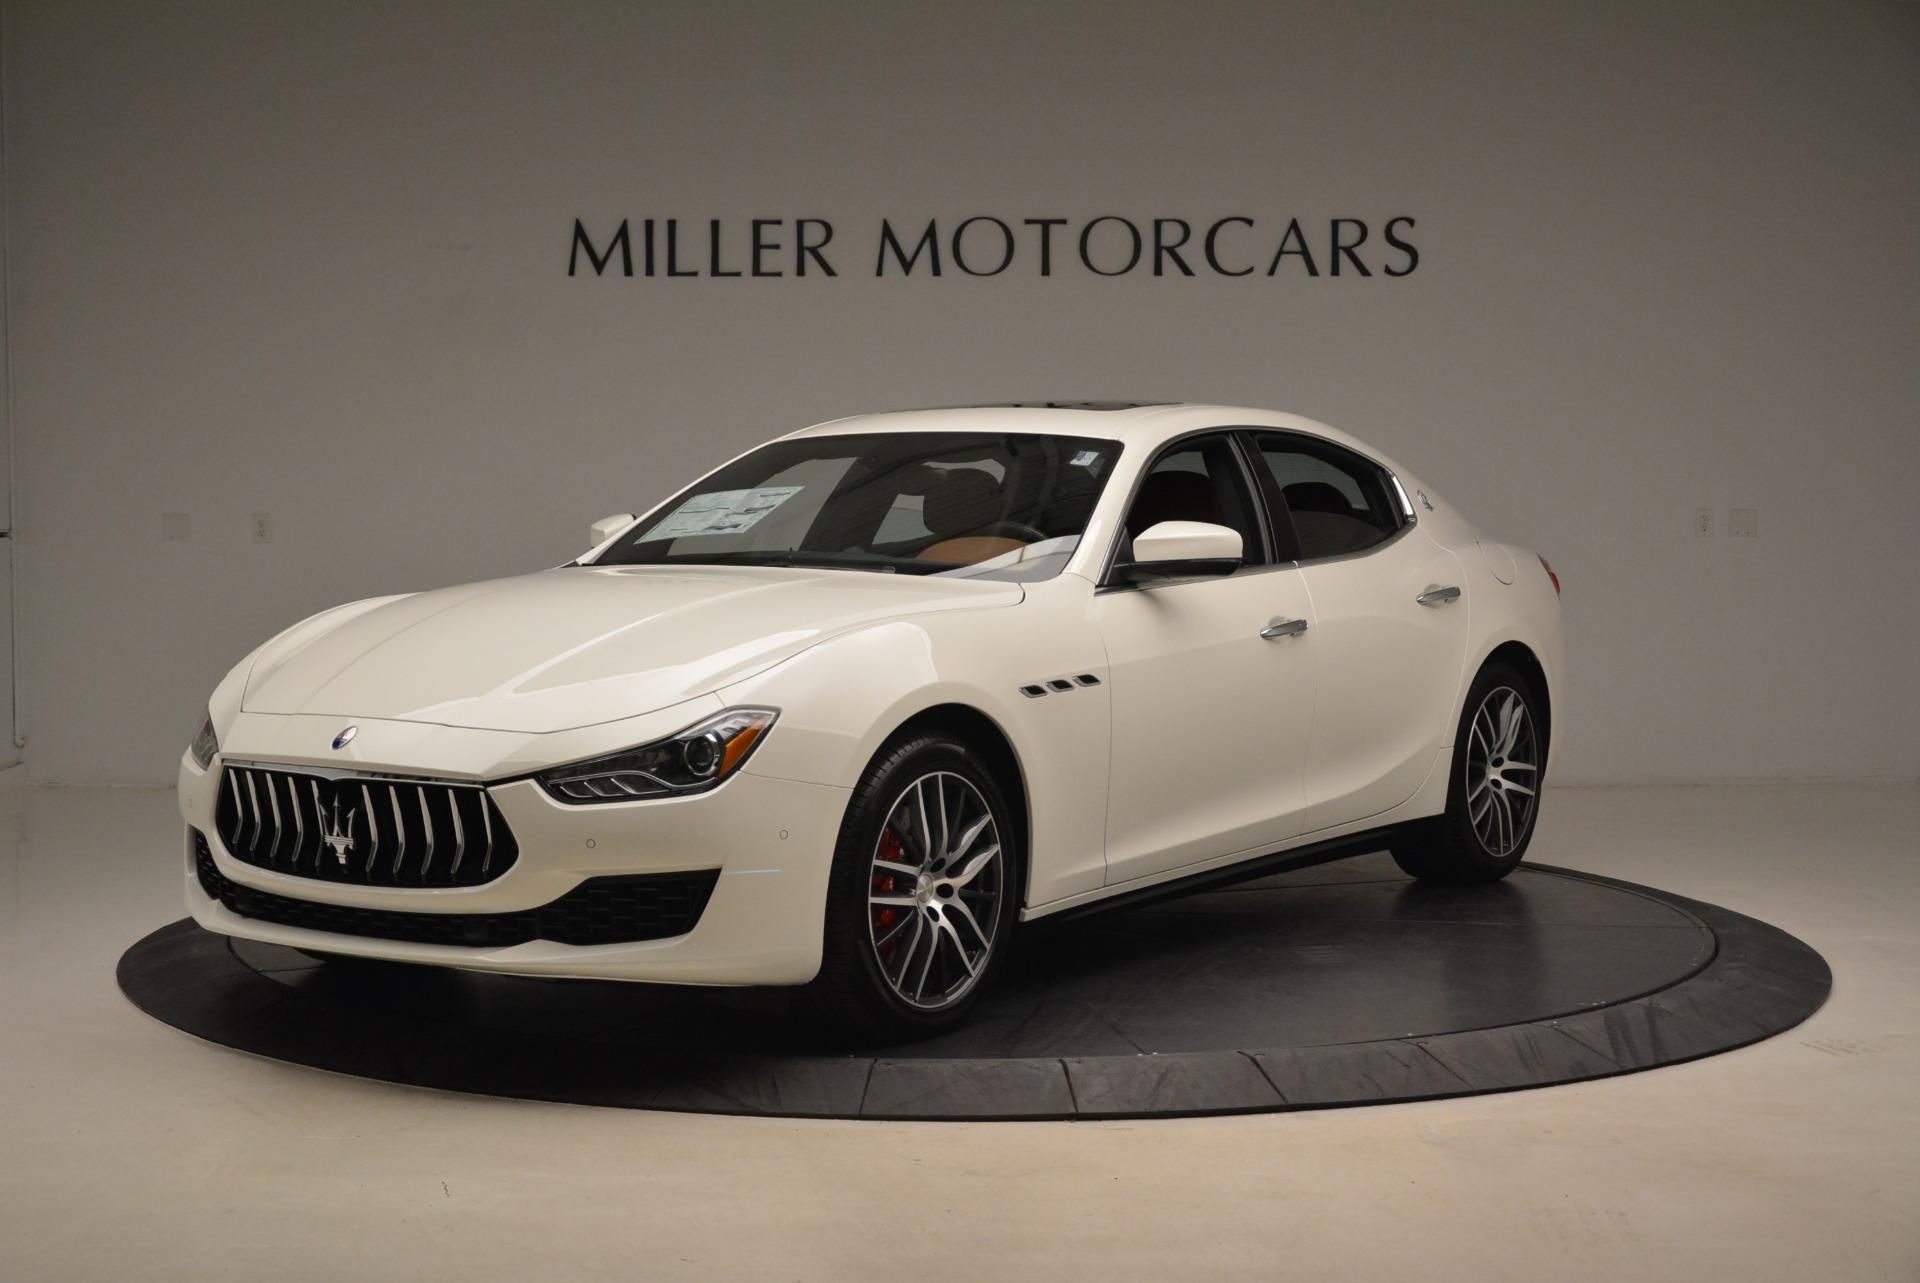 New 2018 Maserati Ghibli S Q4 For Sale In Greenwich, CT 2074_main